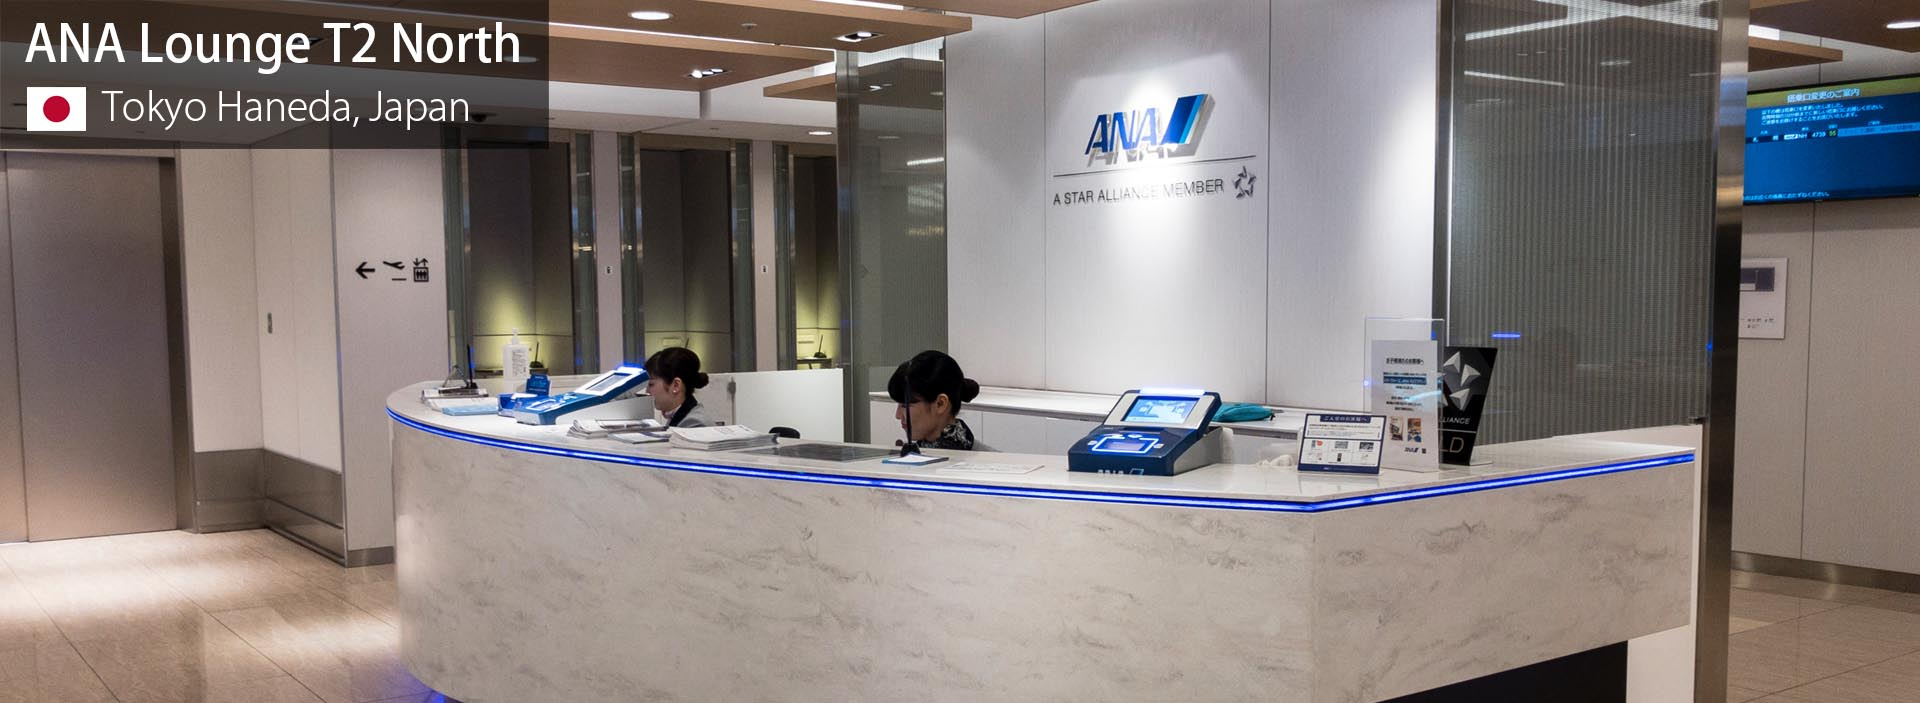 Lounge Review: ANA Lounge (Domestic Terminal North) at Tokyo Haneda